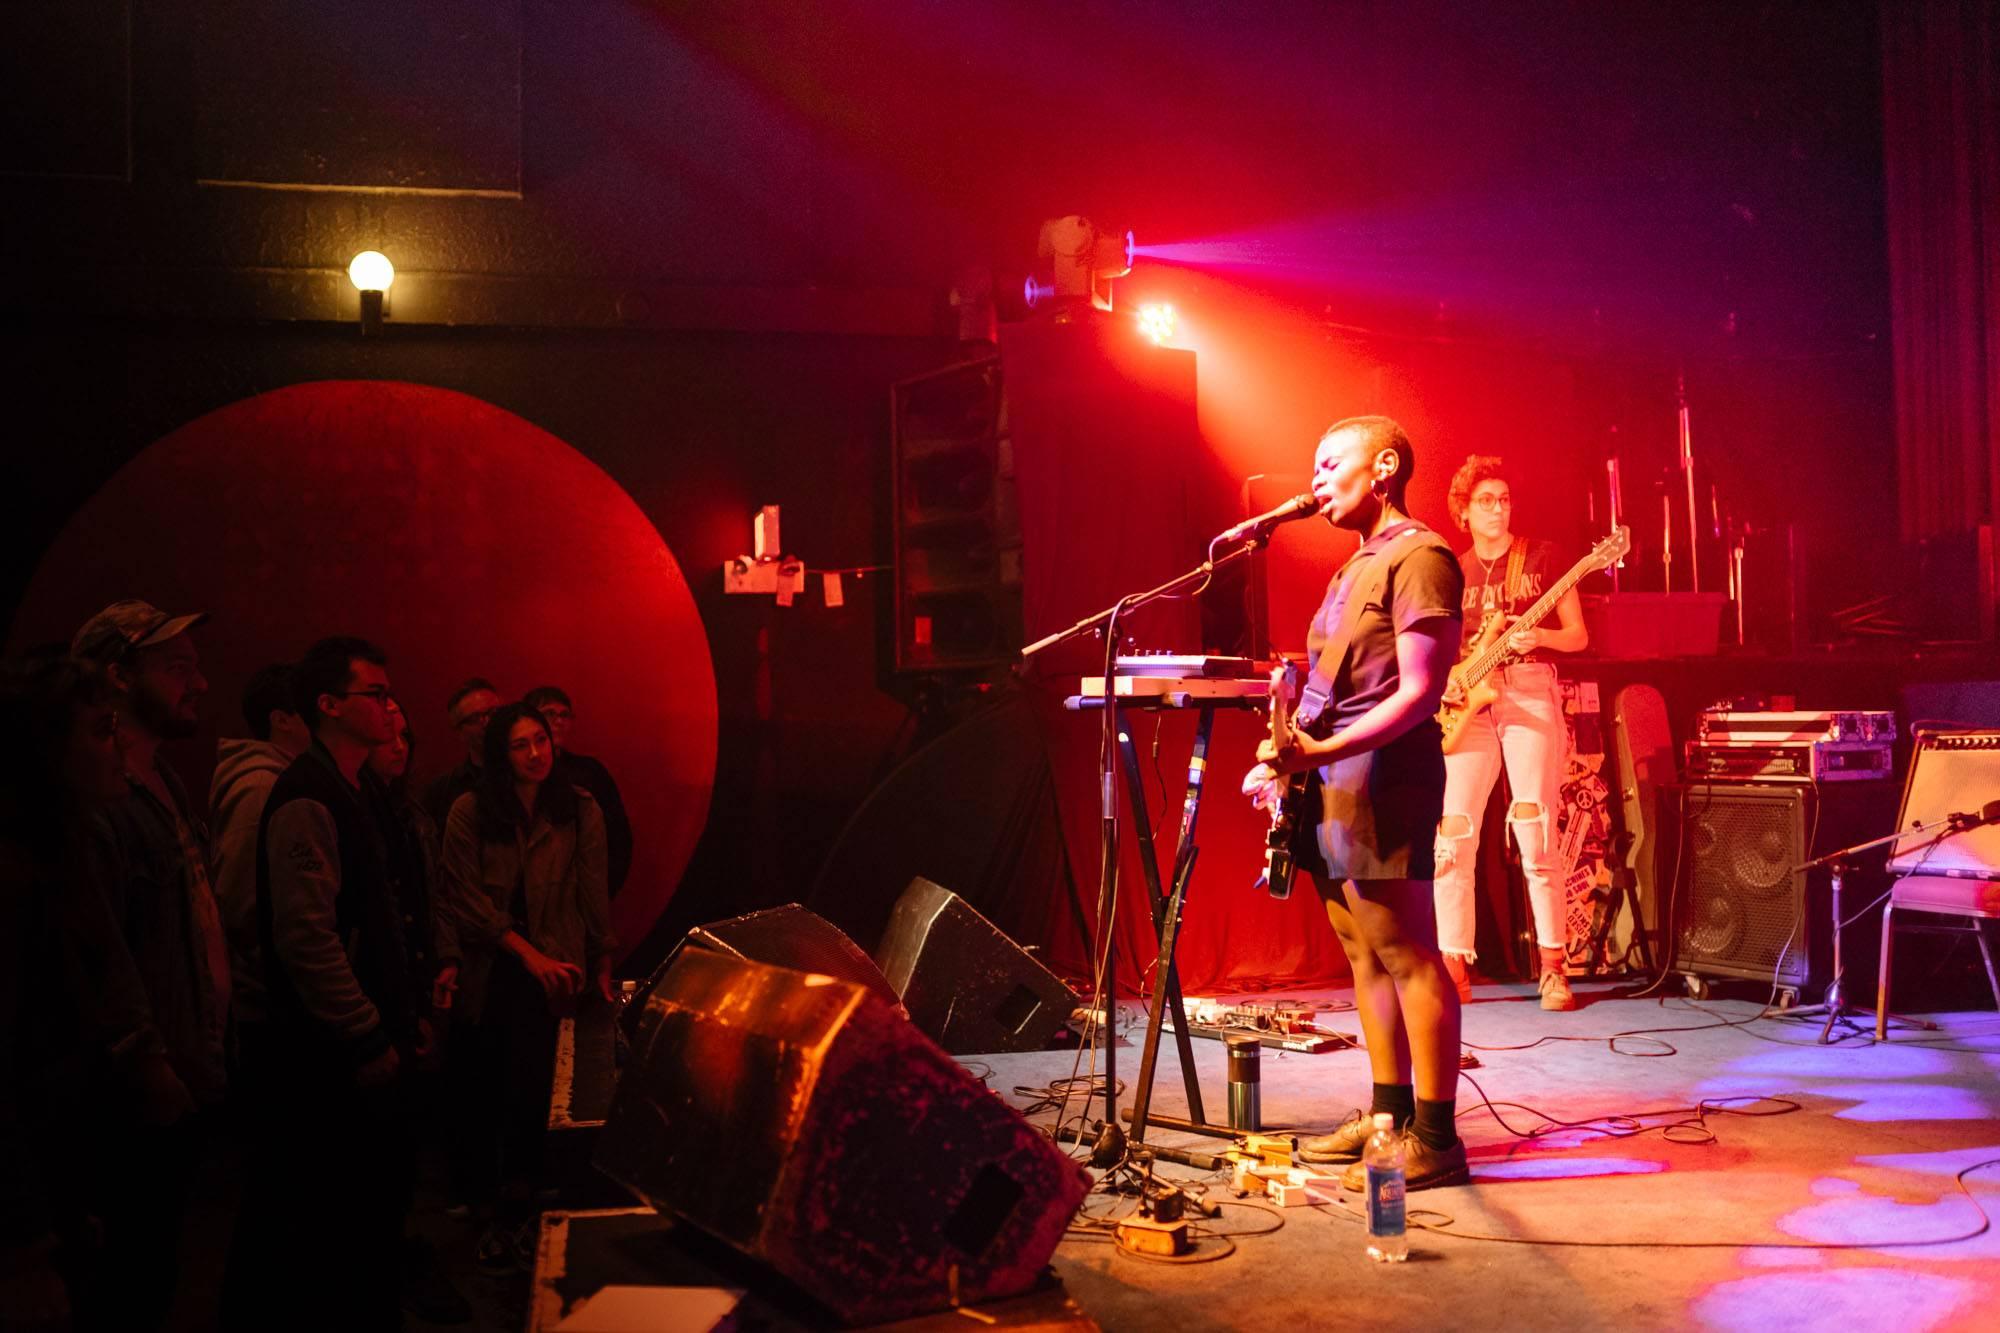 Vagabon at the Fox Cabaret, Vancouver, Sept 25 2017. Dhruv Govil photo.